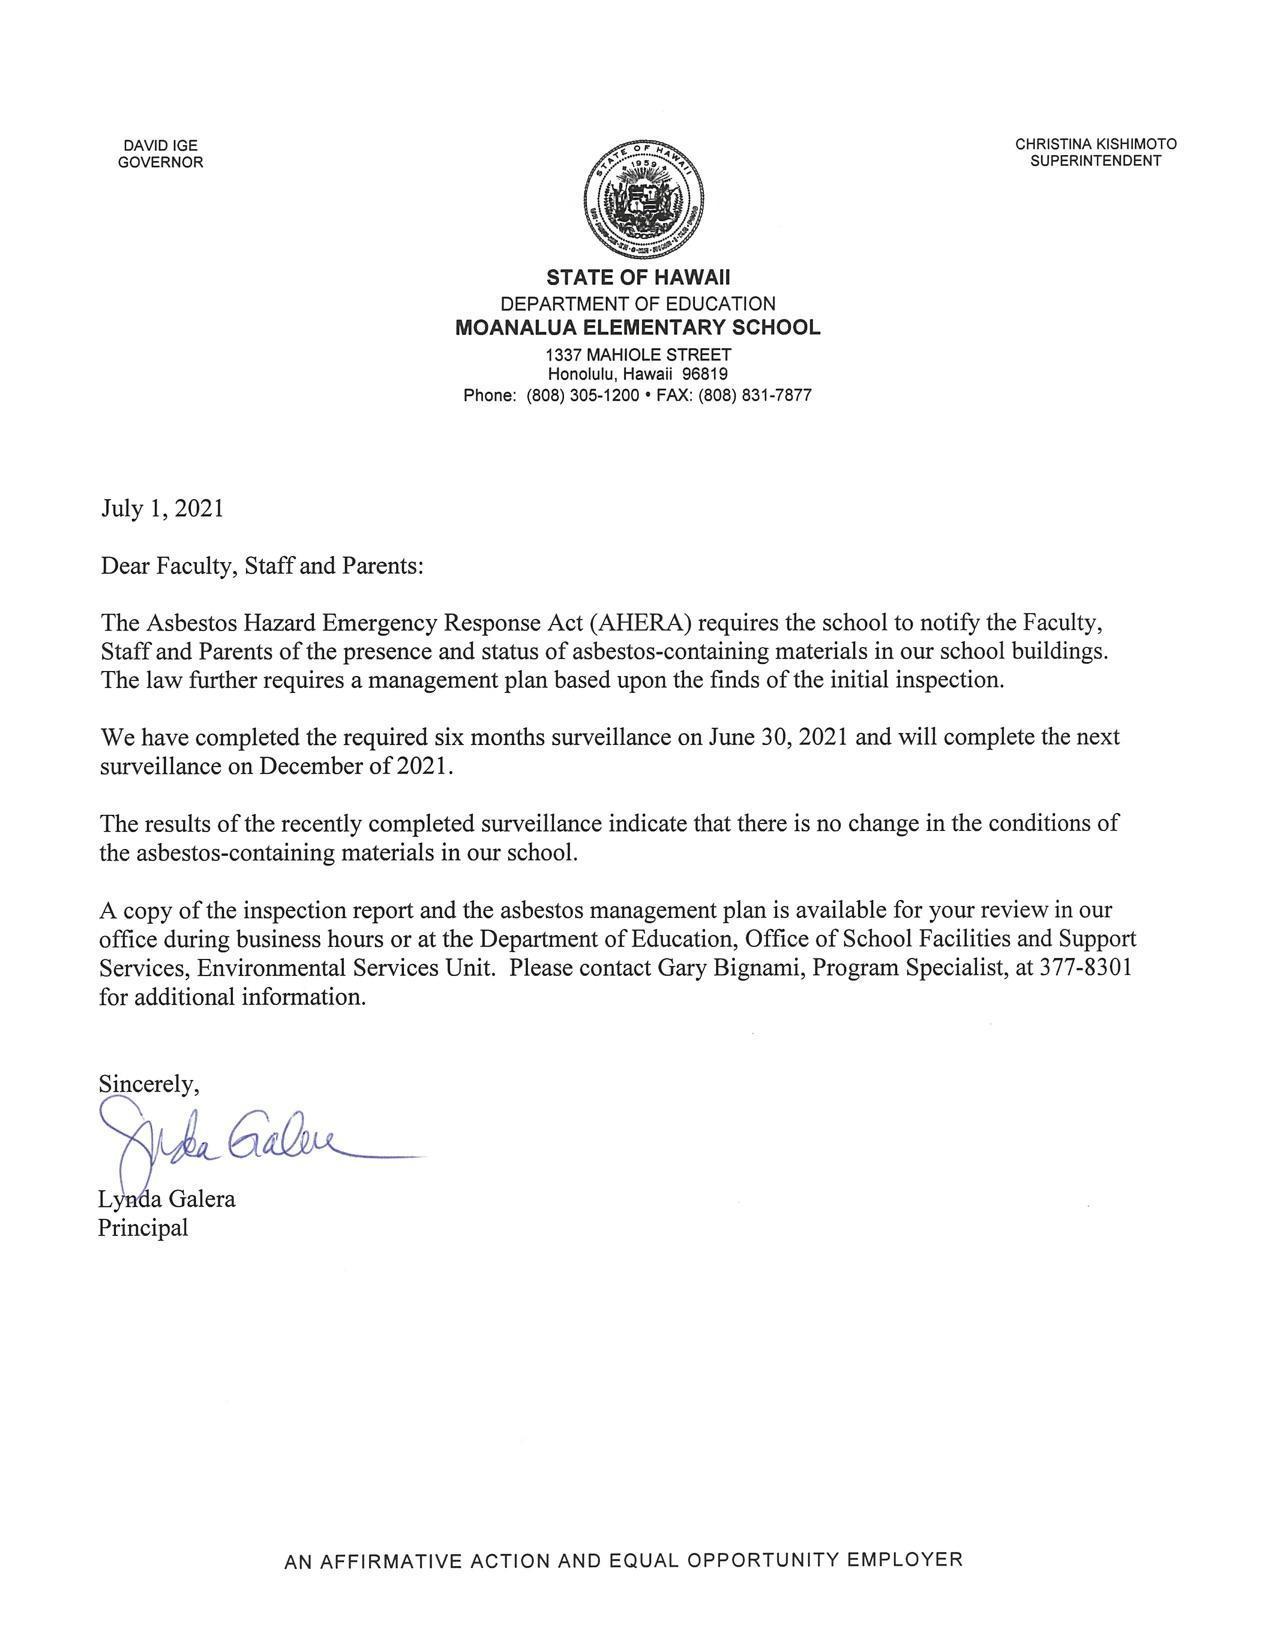 Asbestos Hazard Emergency Response Act letter